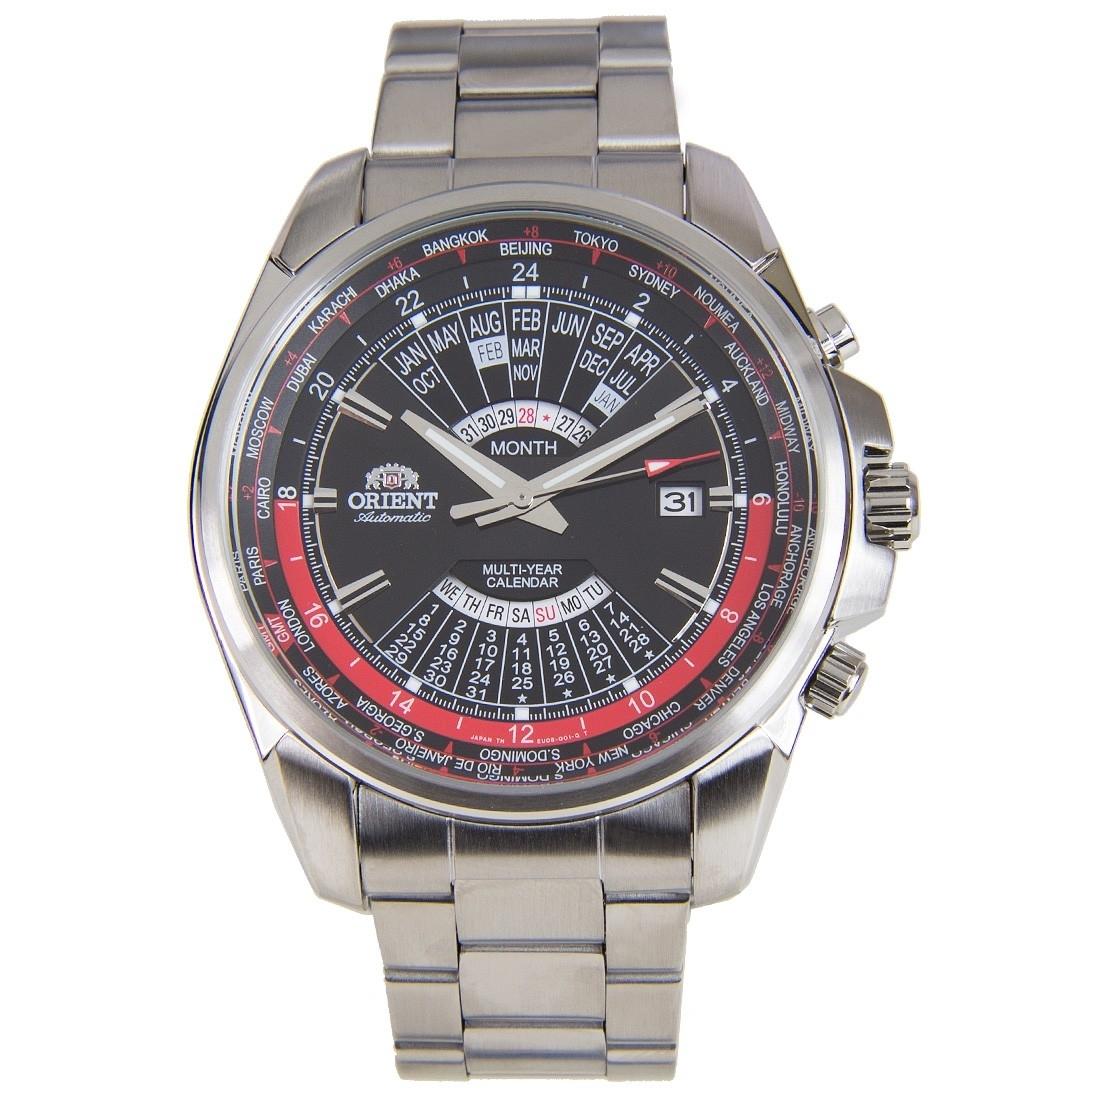 Orient Automatic World Time Multi Year Calendar Watch Eu0B001B